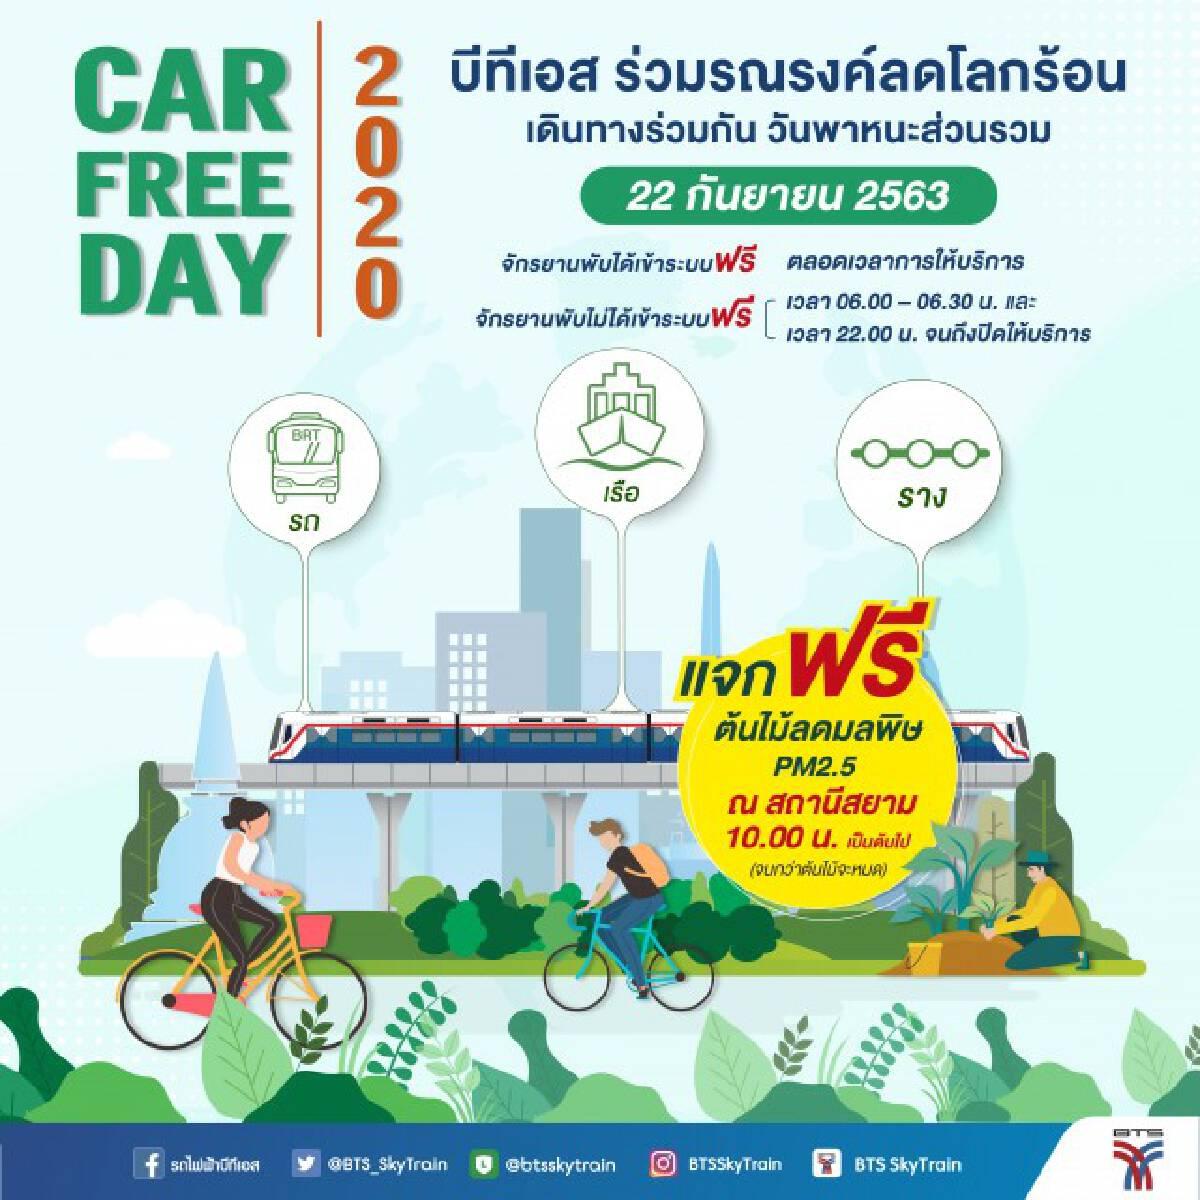 Free SkyTrain ride for cyclists on Bangkok Car Free Day